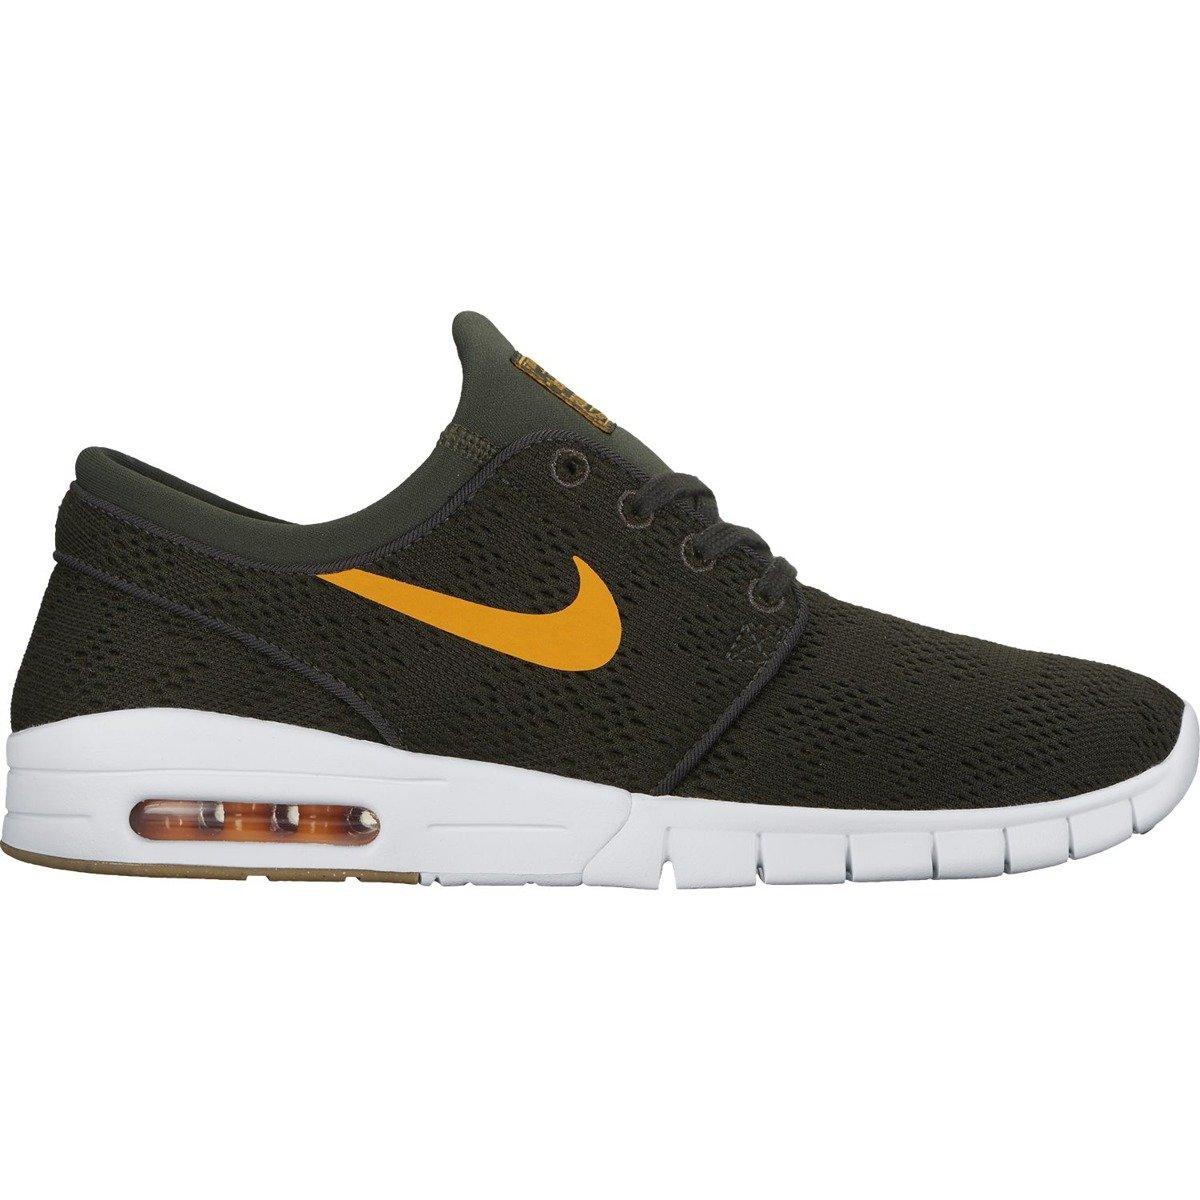 best service 11146 58d70 shoes nike sb stefan janoski max sequoiacircuit orange-gum light brown  green  Shoes  Nike SB Shoes  nike janoski SALE  Sale 50% -70%  Shoes  Brands ...